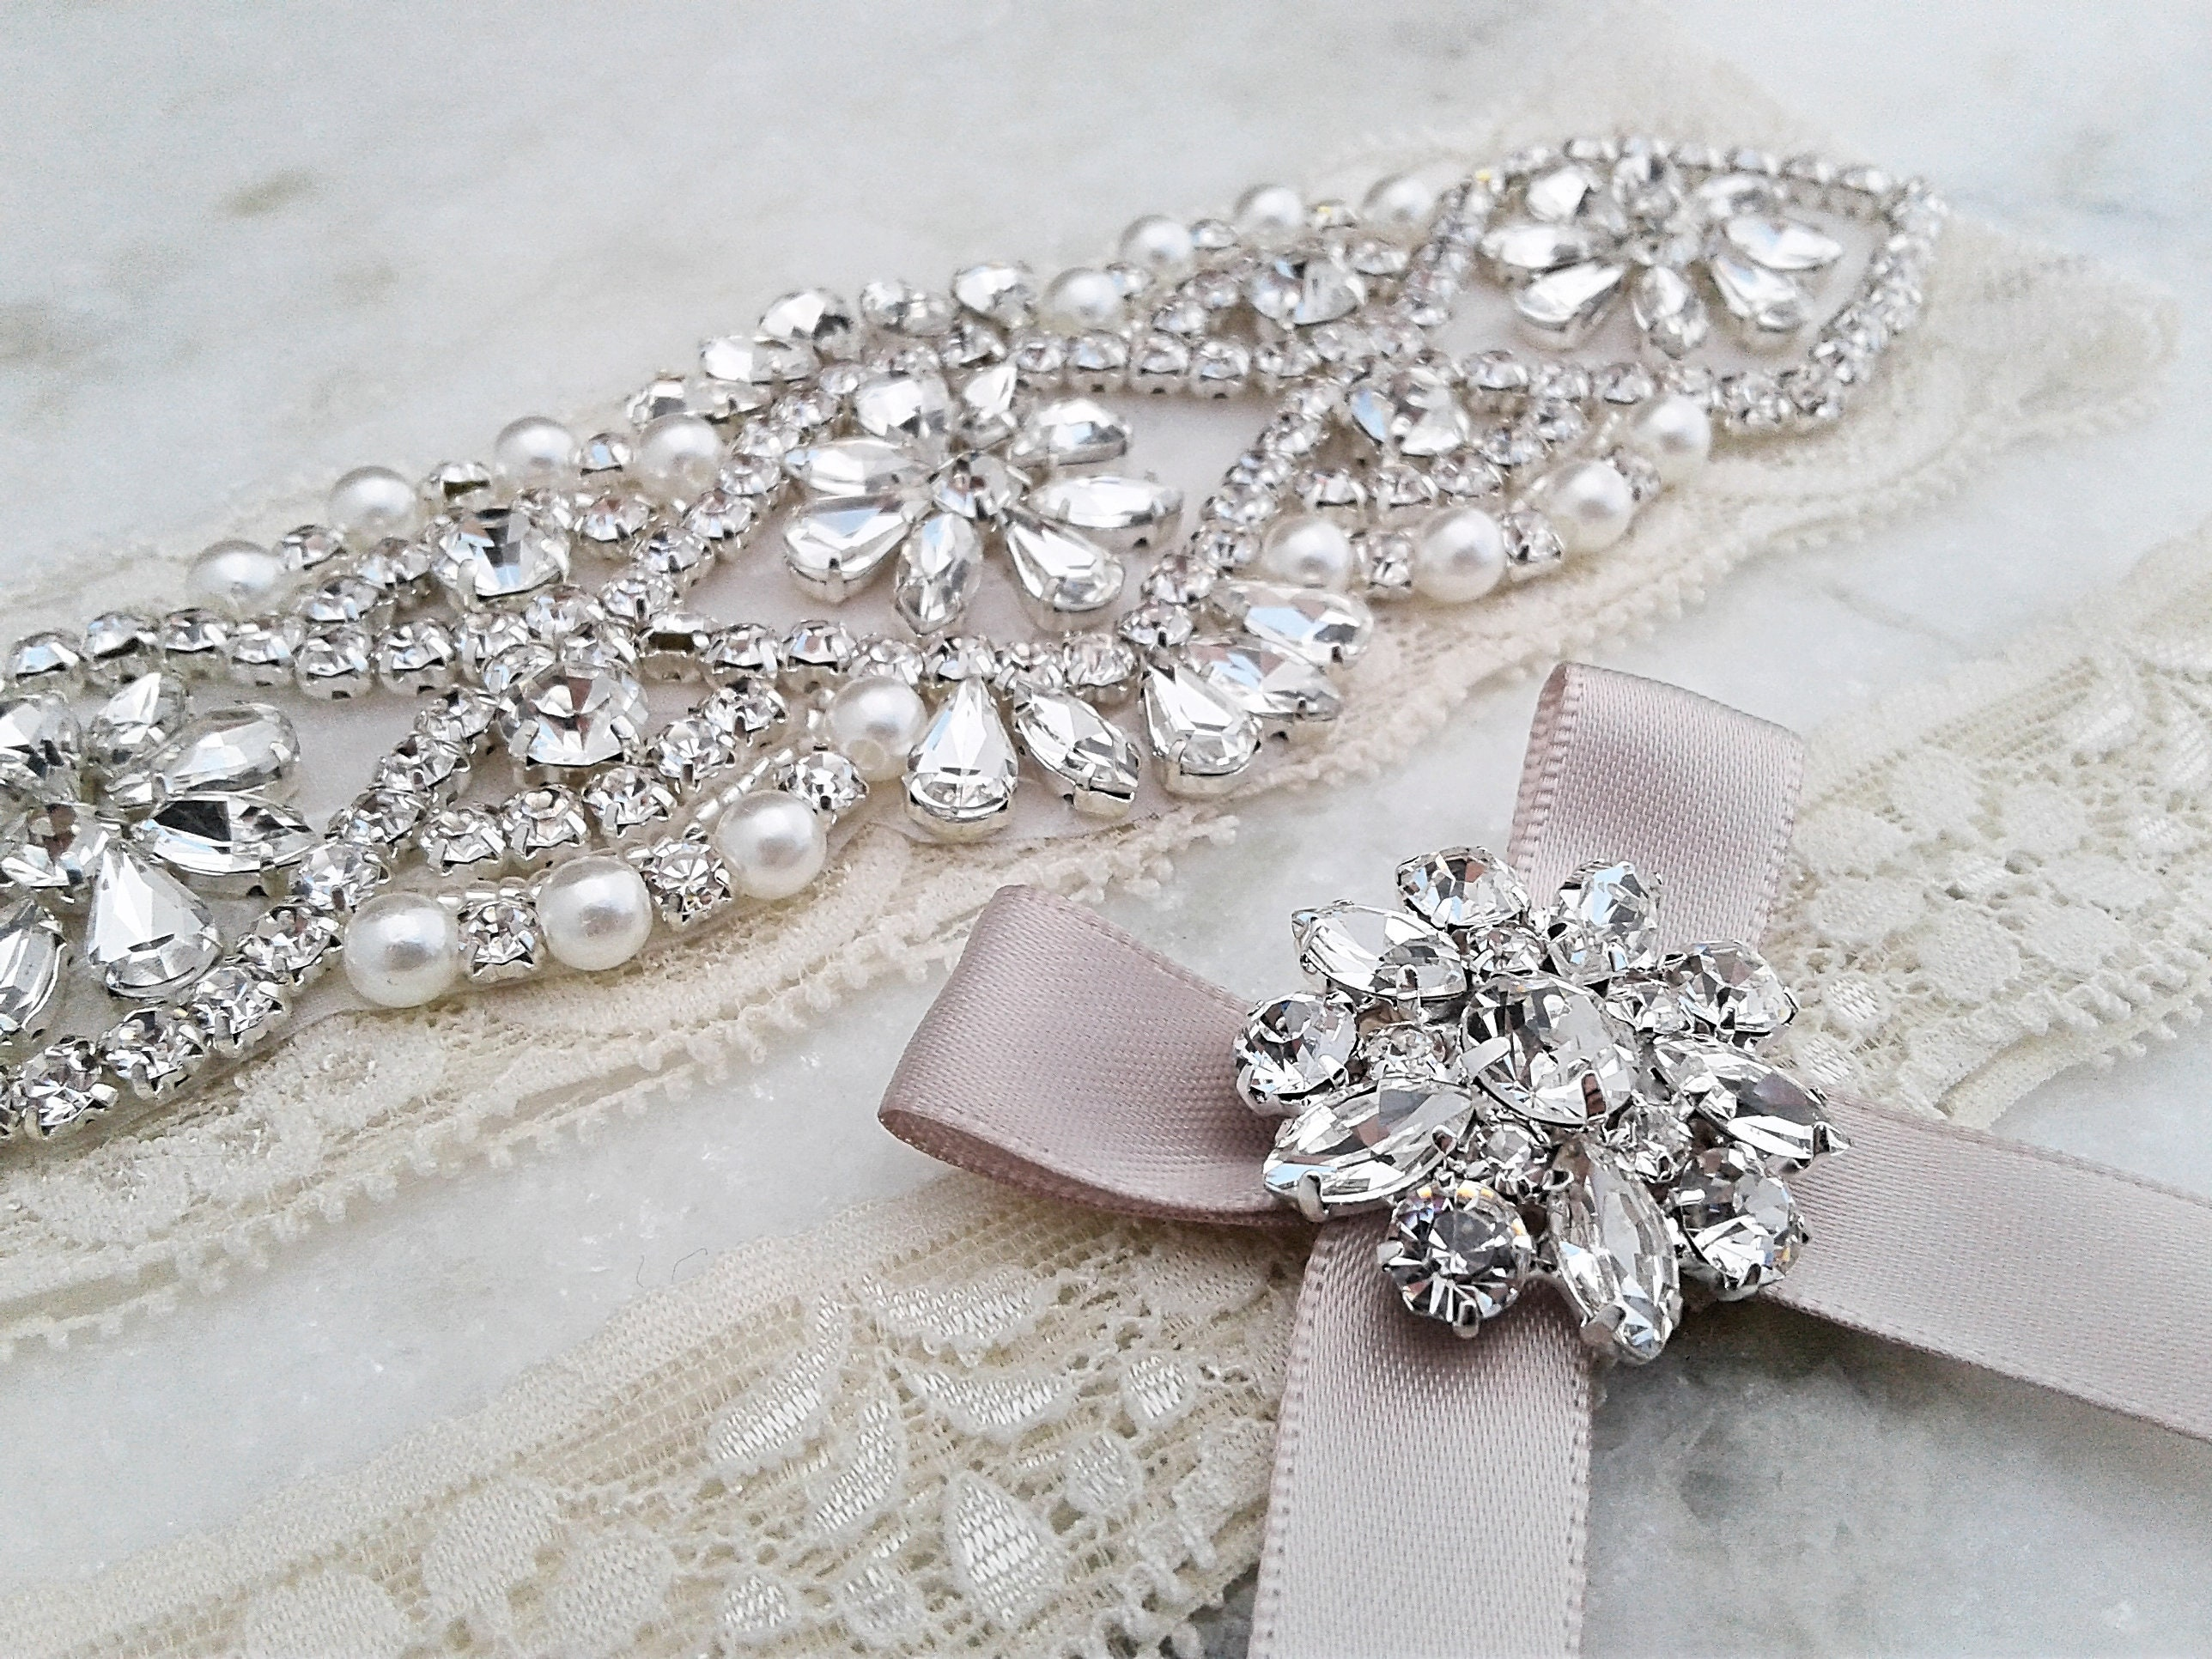 M/_RAC Womens 2 Piece Set White Ivory Lace Rhinestone Bridal Wedding Garters